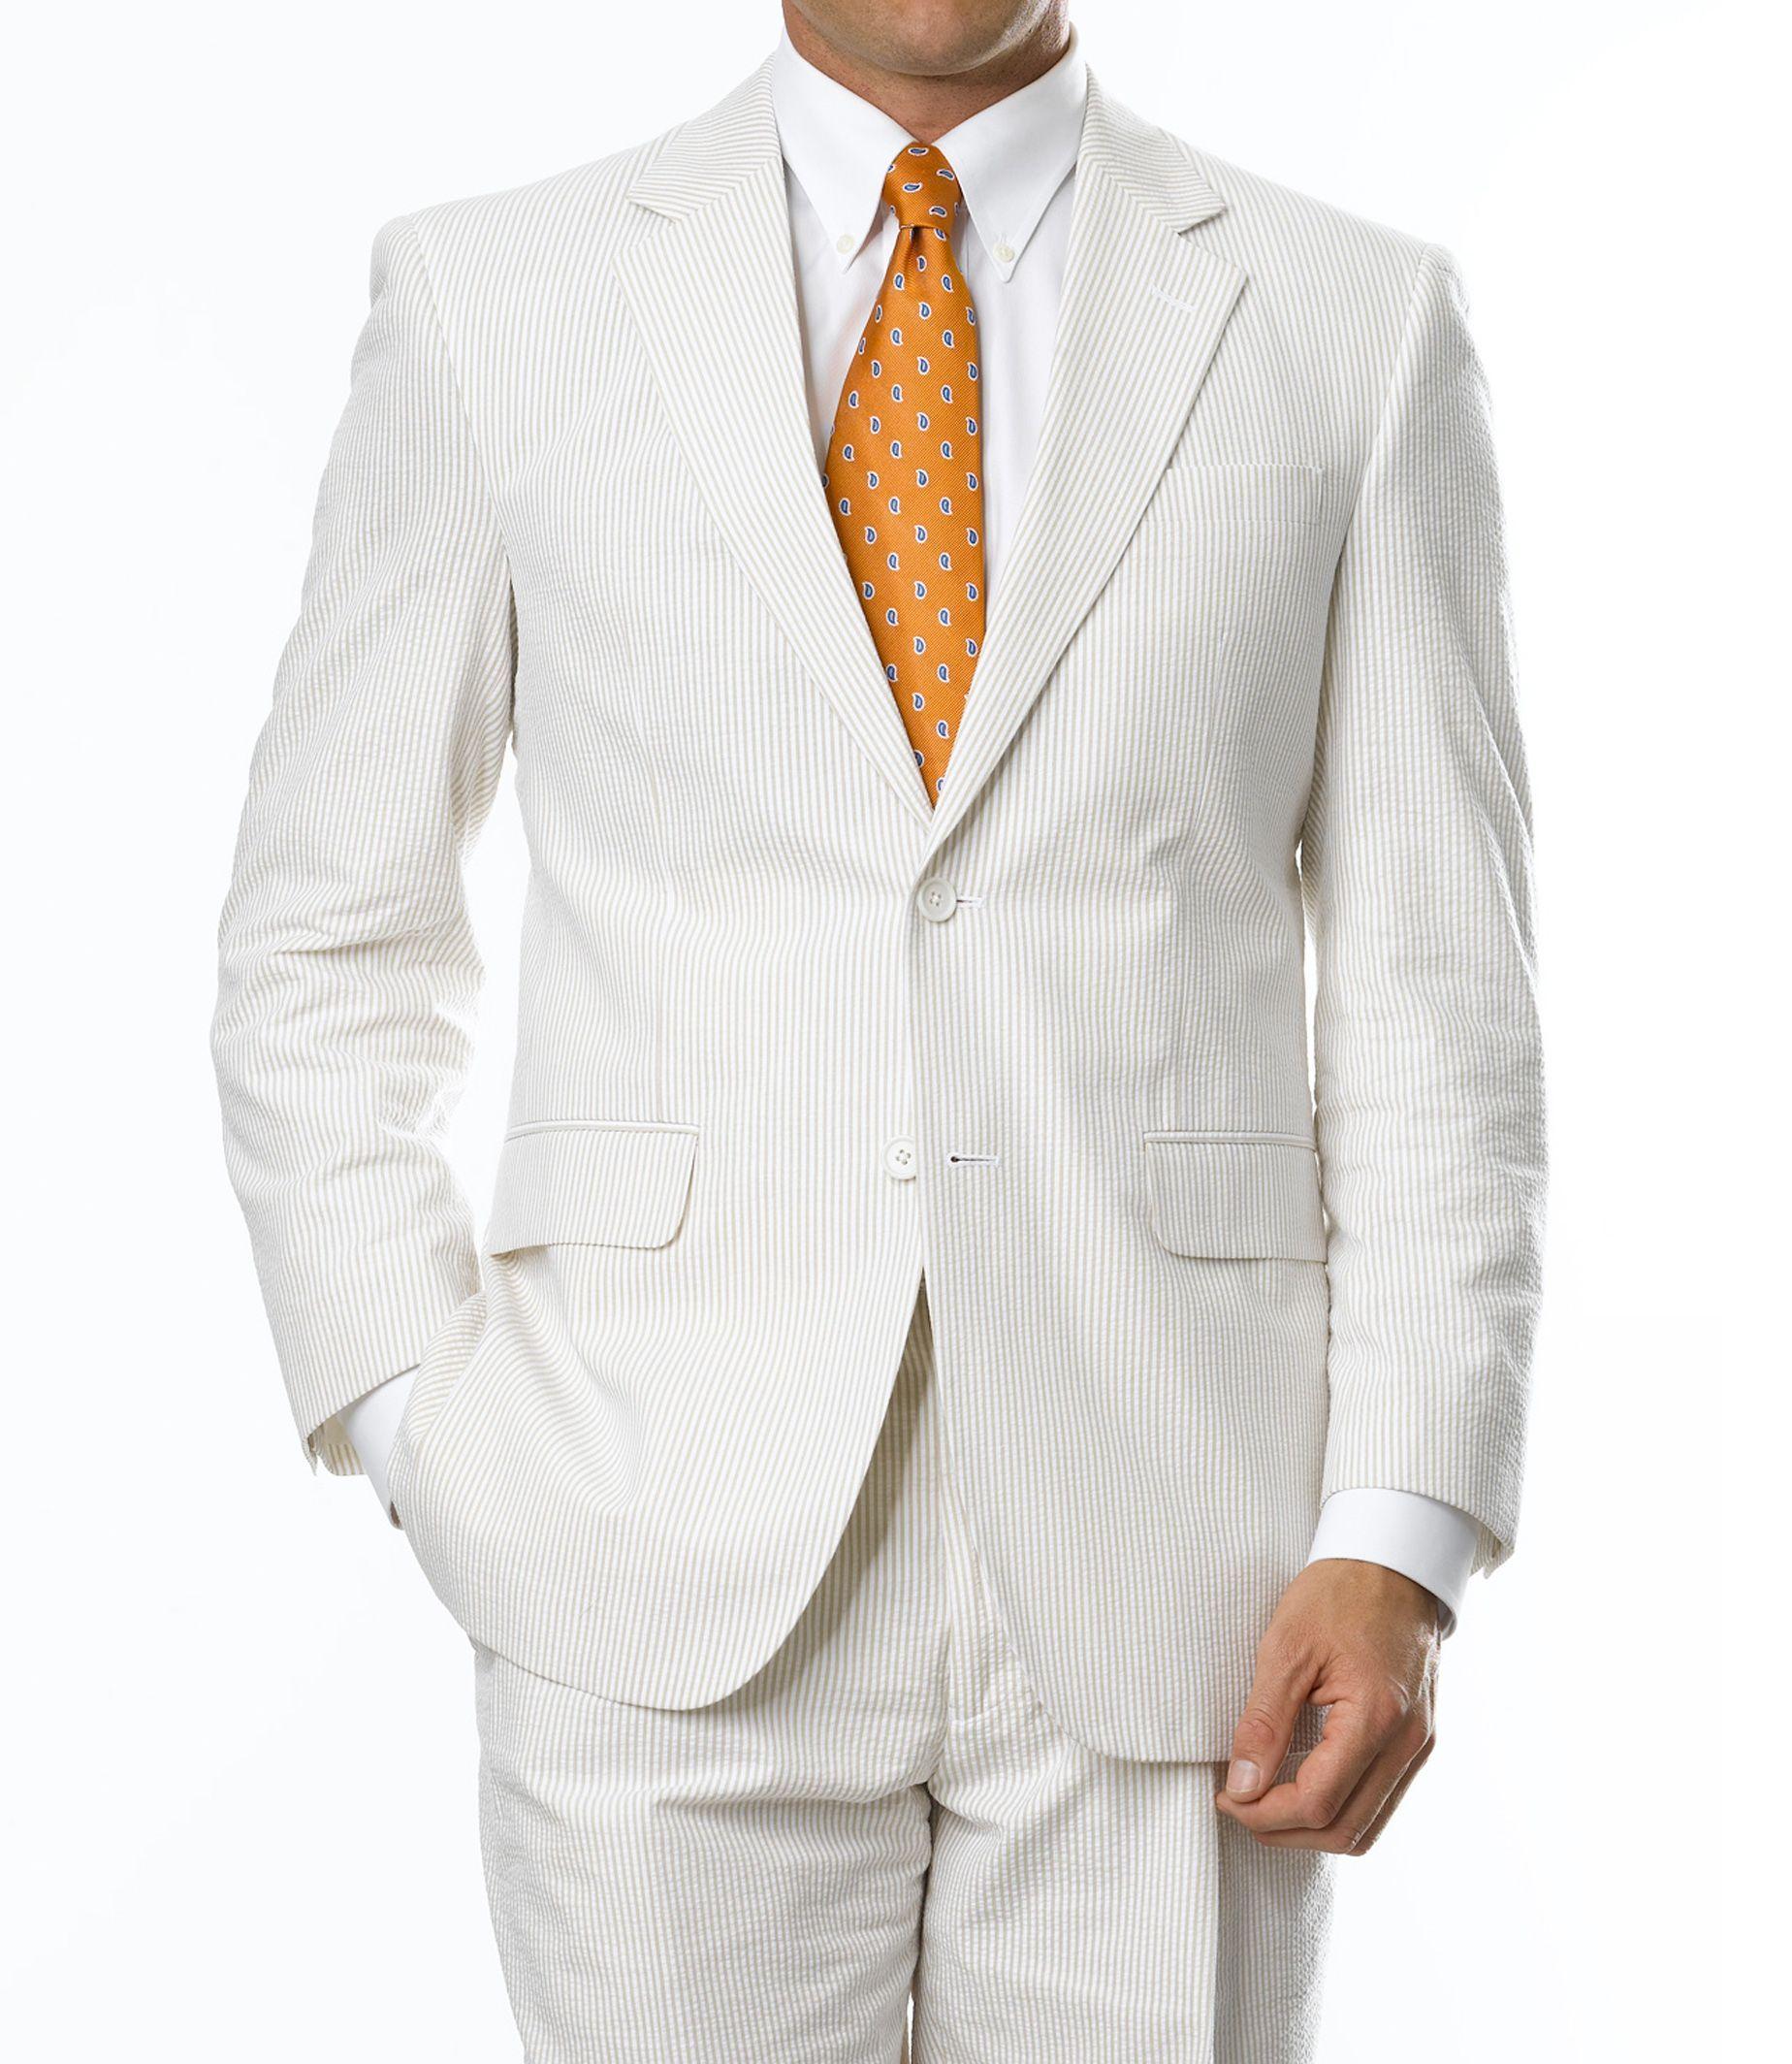 Edwardian Titanic Style Men's Clothing for Sale Suit